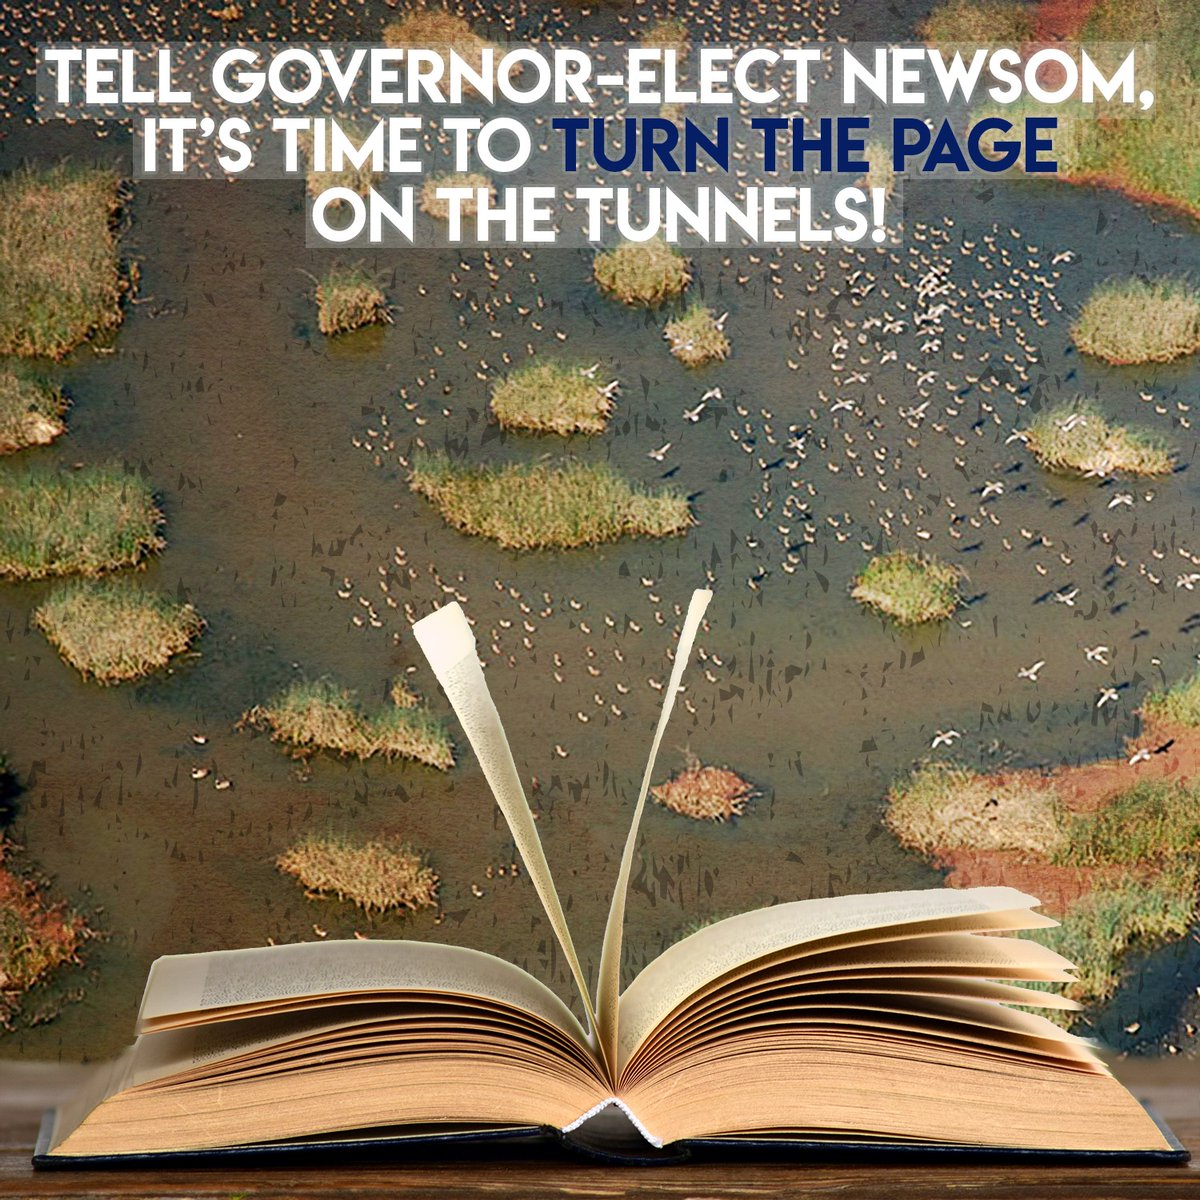 Delta stewardship council nixes Delta Tunnels